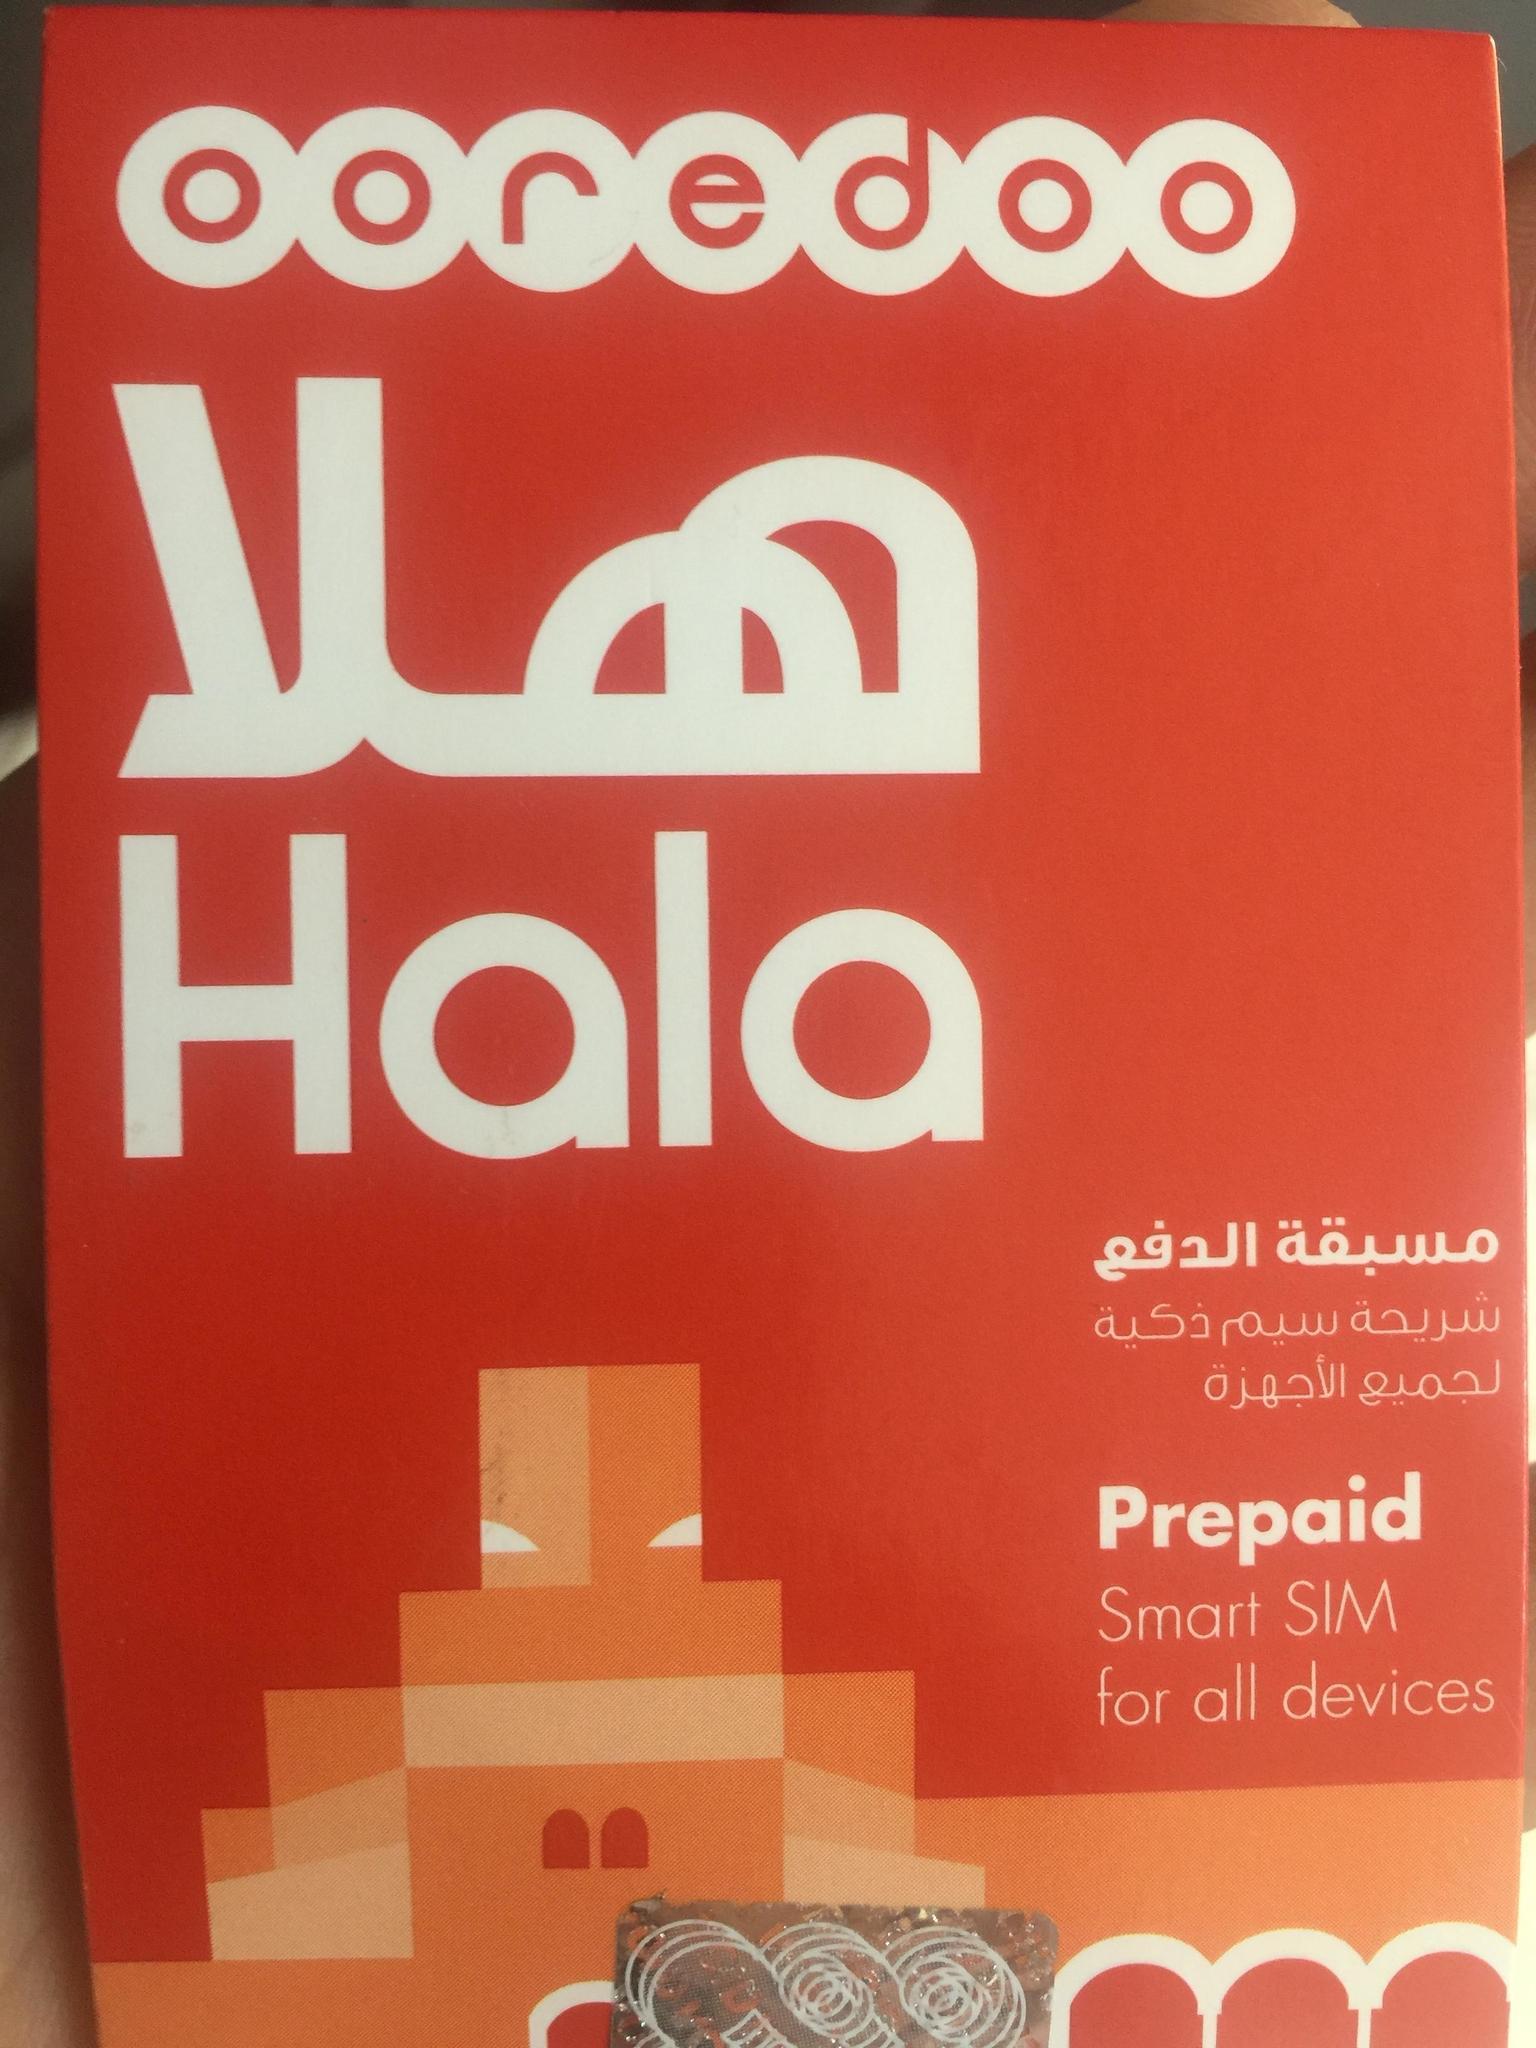 OOREDOO per-paid new SIM No 5578 8900, 555 432 08 & 33 7171 94 on sale